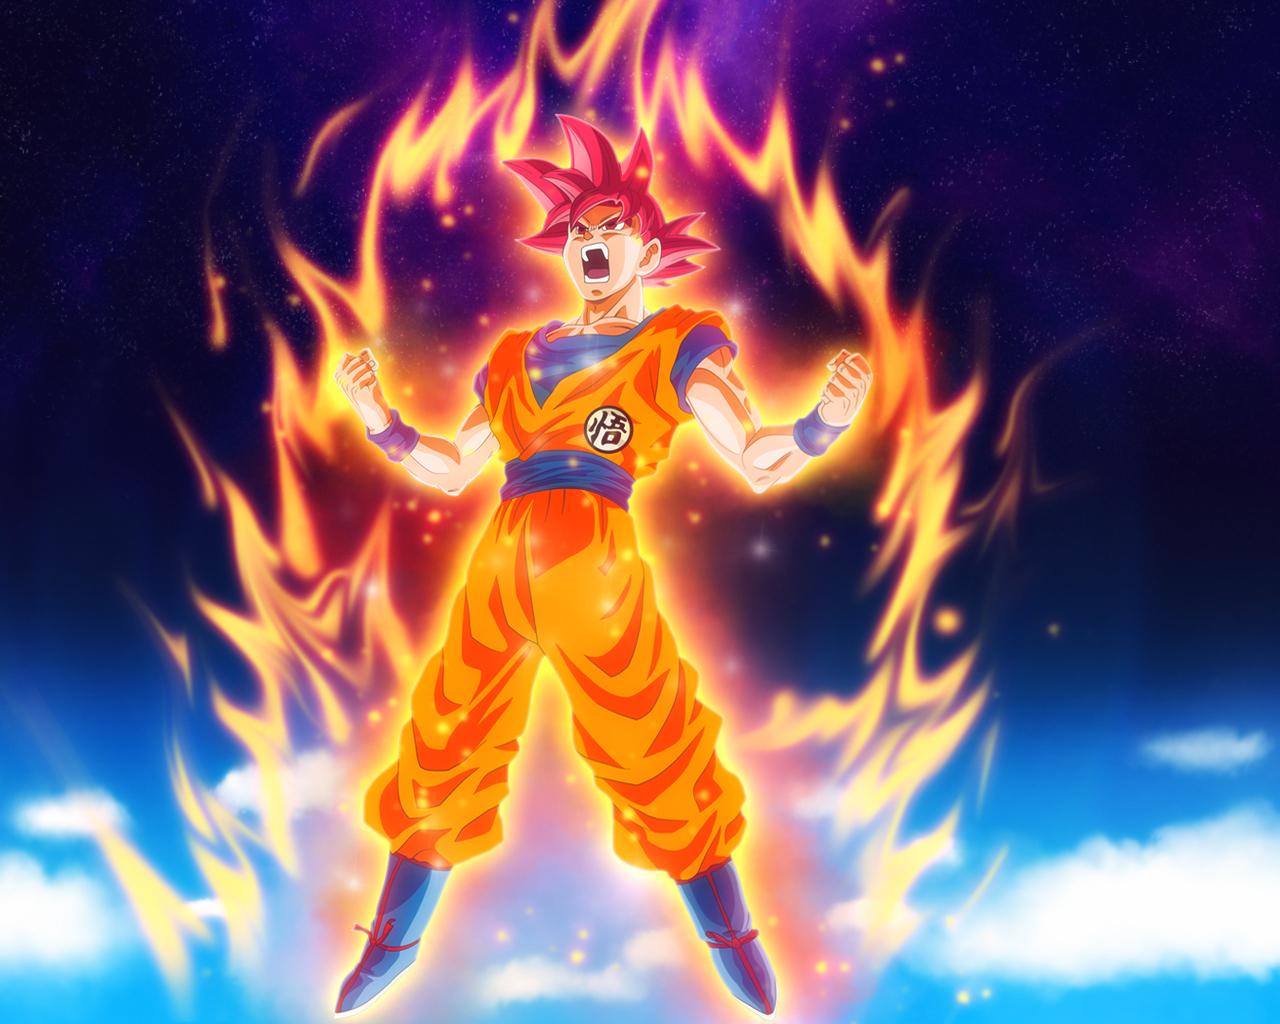 1280x1024 Dragon Ball Z Goku 1280x1024 Resolution Hd 4k